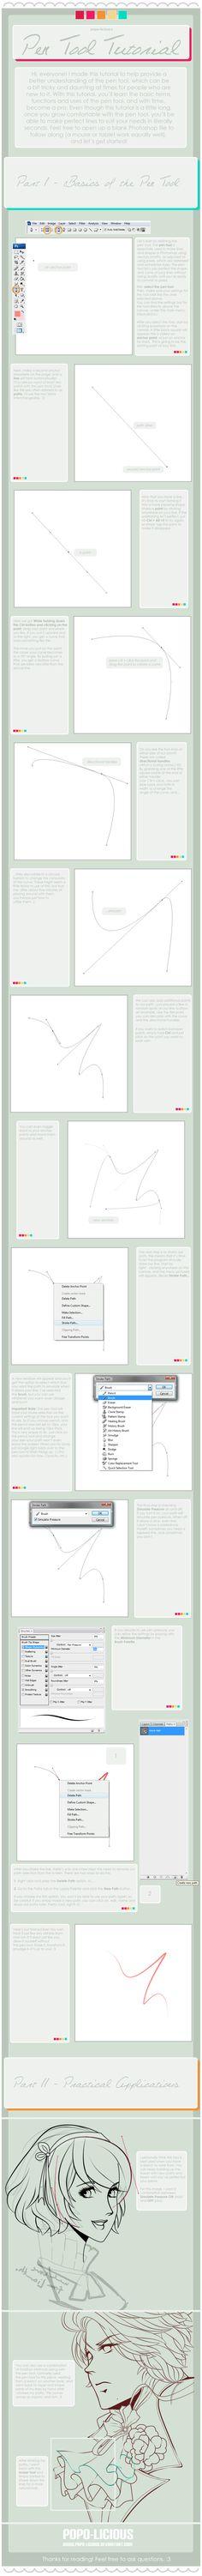 Pen Tool Tutorial by =Popo-Licious on deviantART